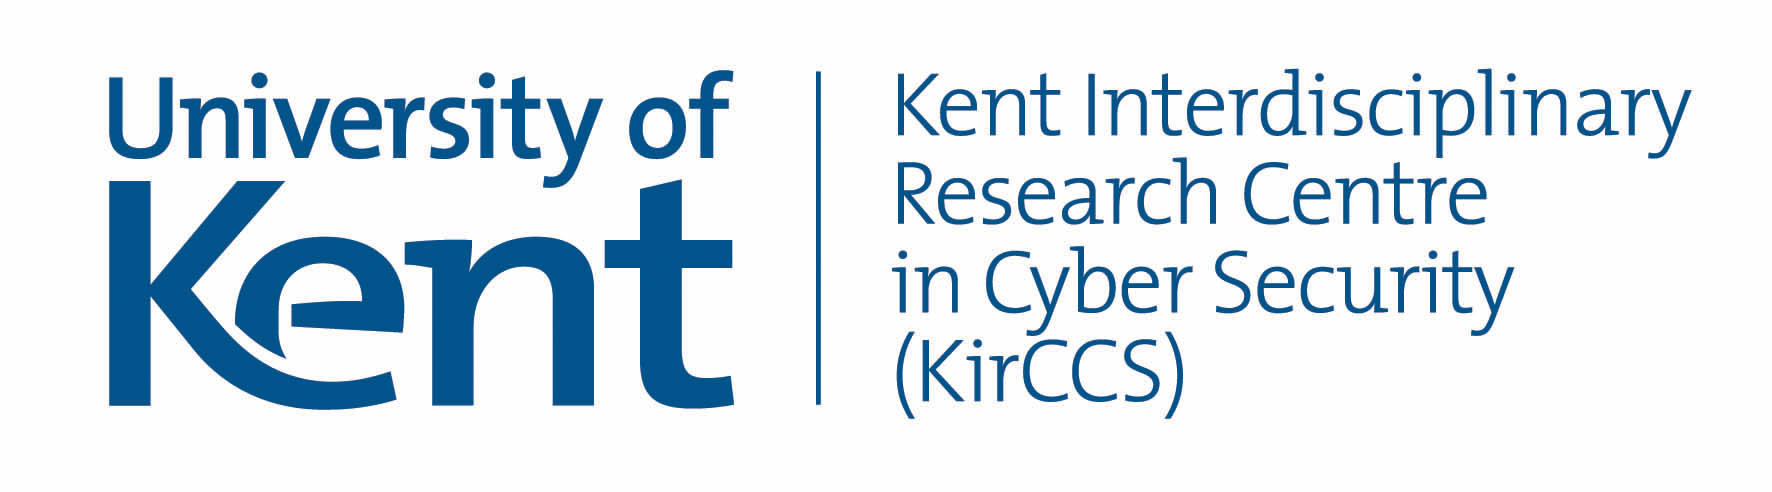 Kent Interdisciplinary Research Centre in Cyber Security (KirCCS) @ University of Kent